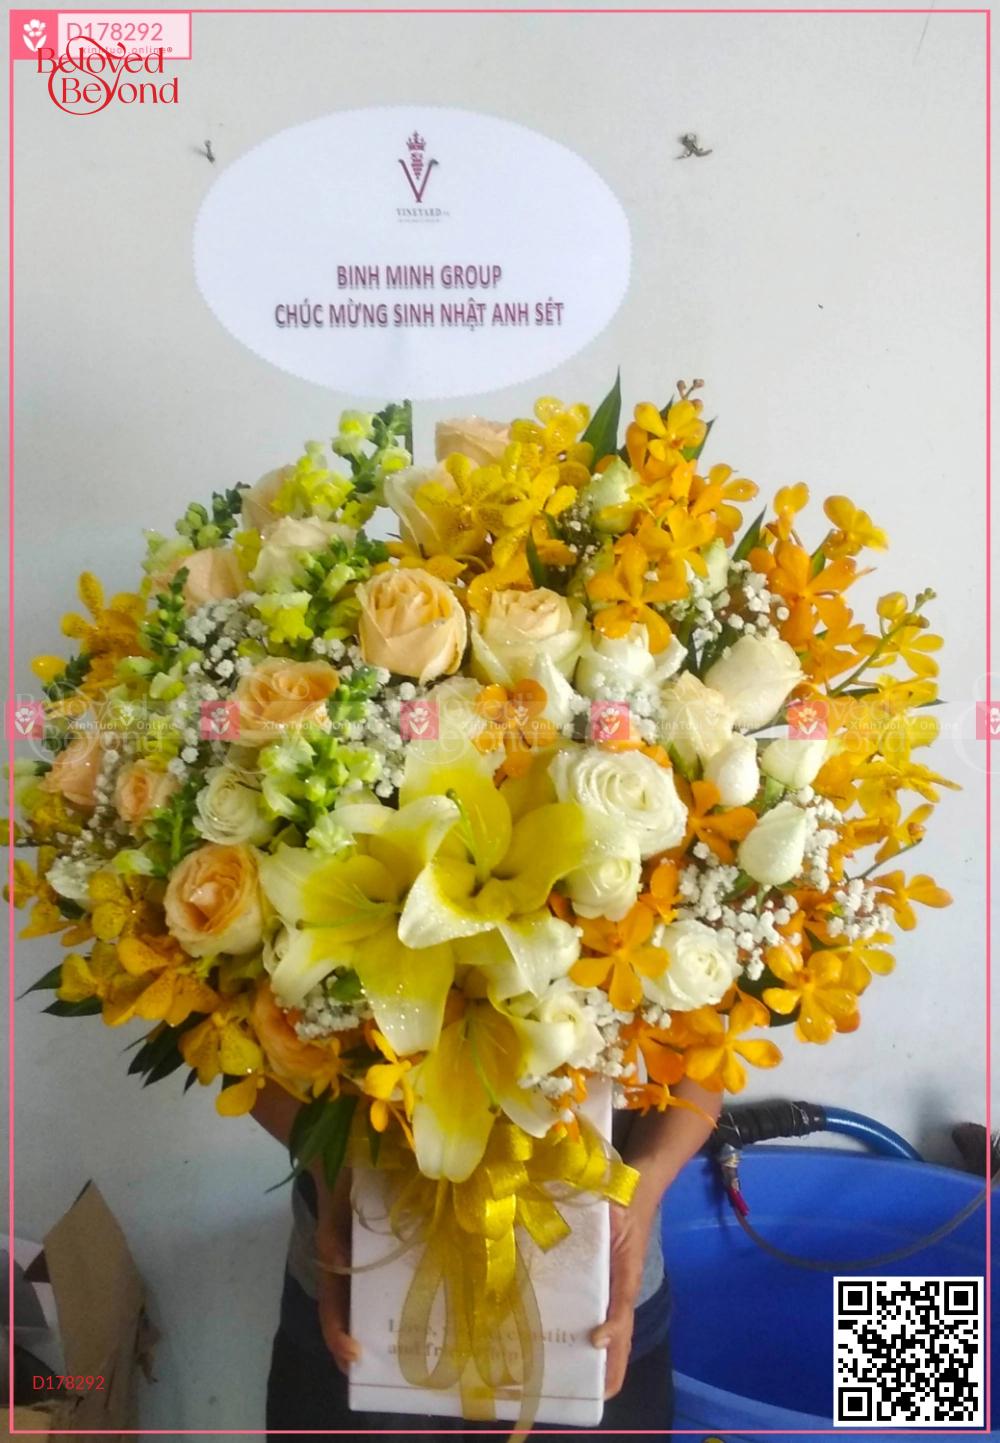 Dịu dàng - D178292 - xinhtuoi.online